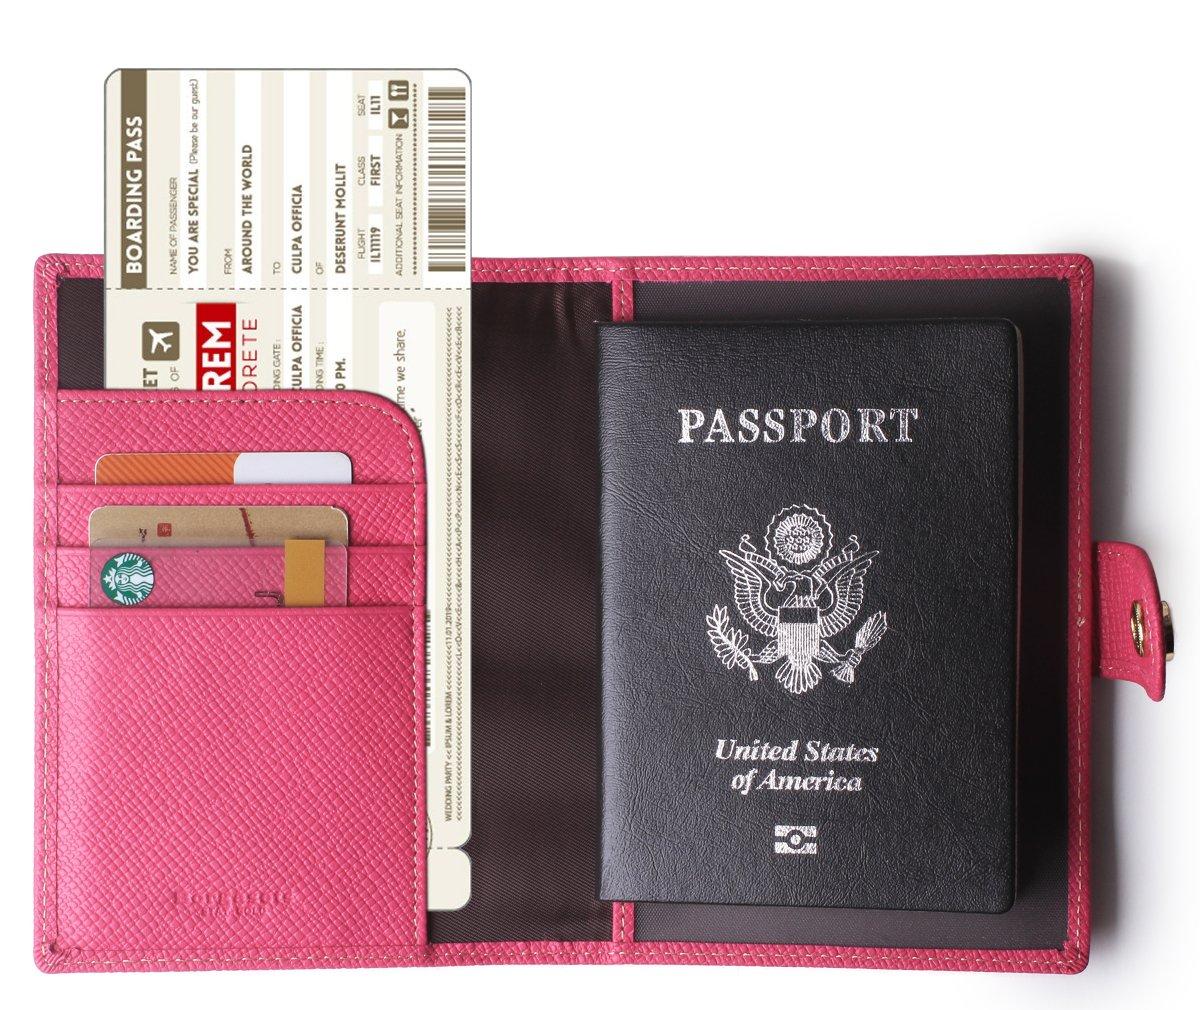 Borgasets Leather Rfid Blocking Travel Passport Holder Cover Slim ID Card Case Wallet Rose Red